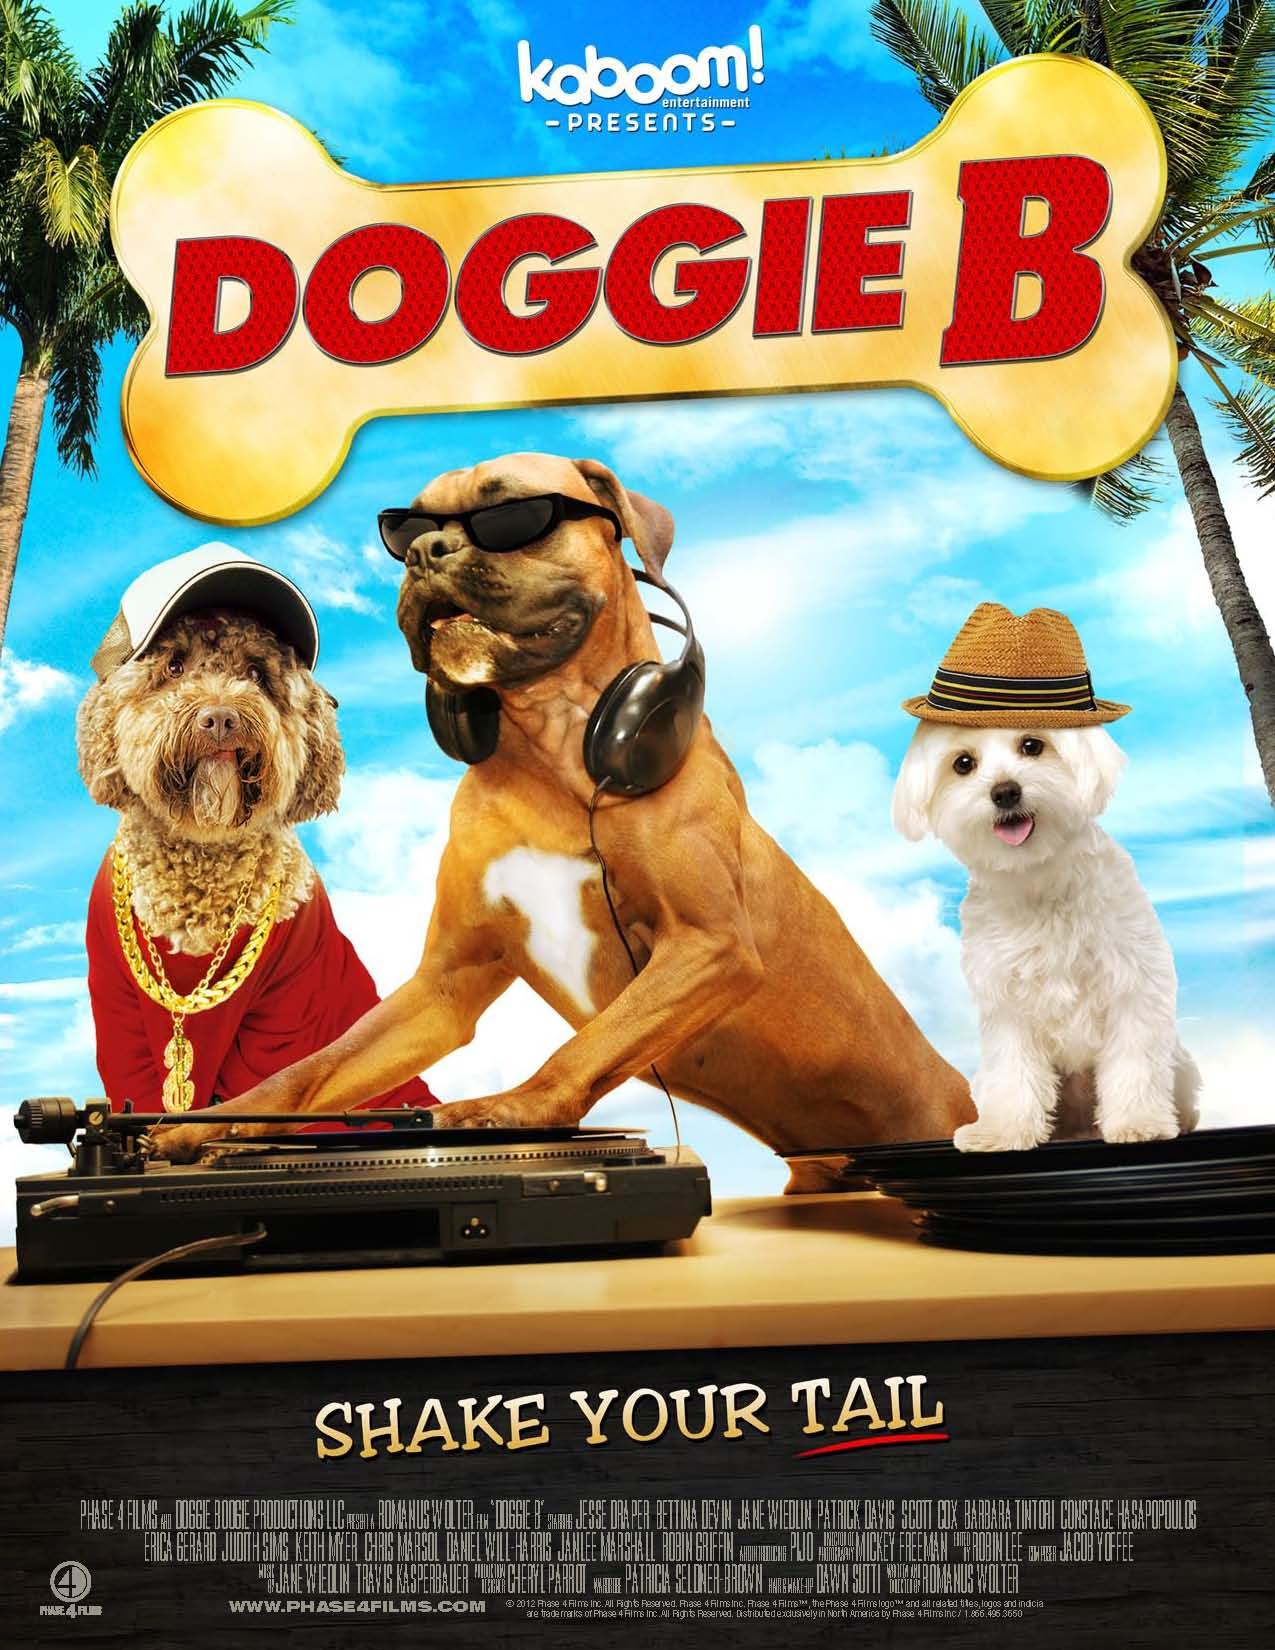 Kaboom Movie Poster Doggie b Movie Poster